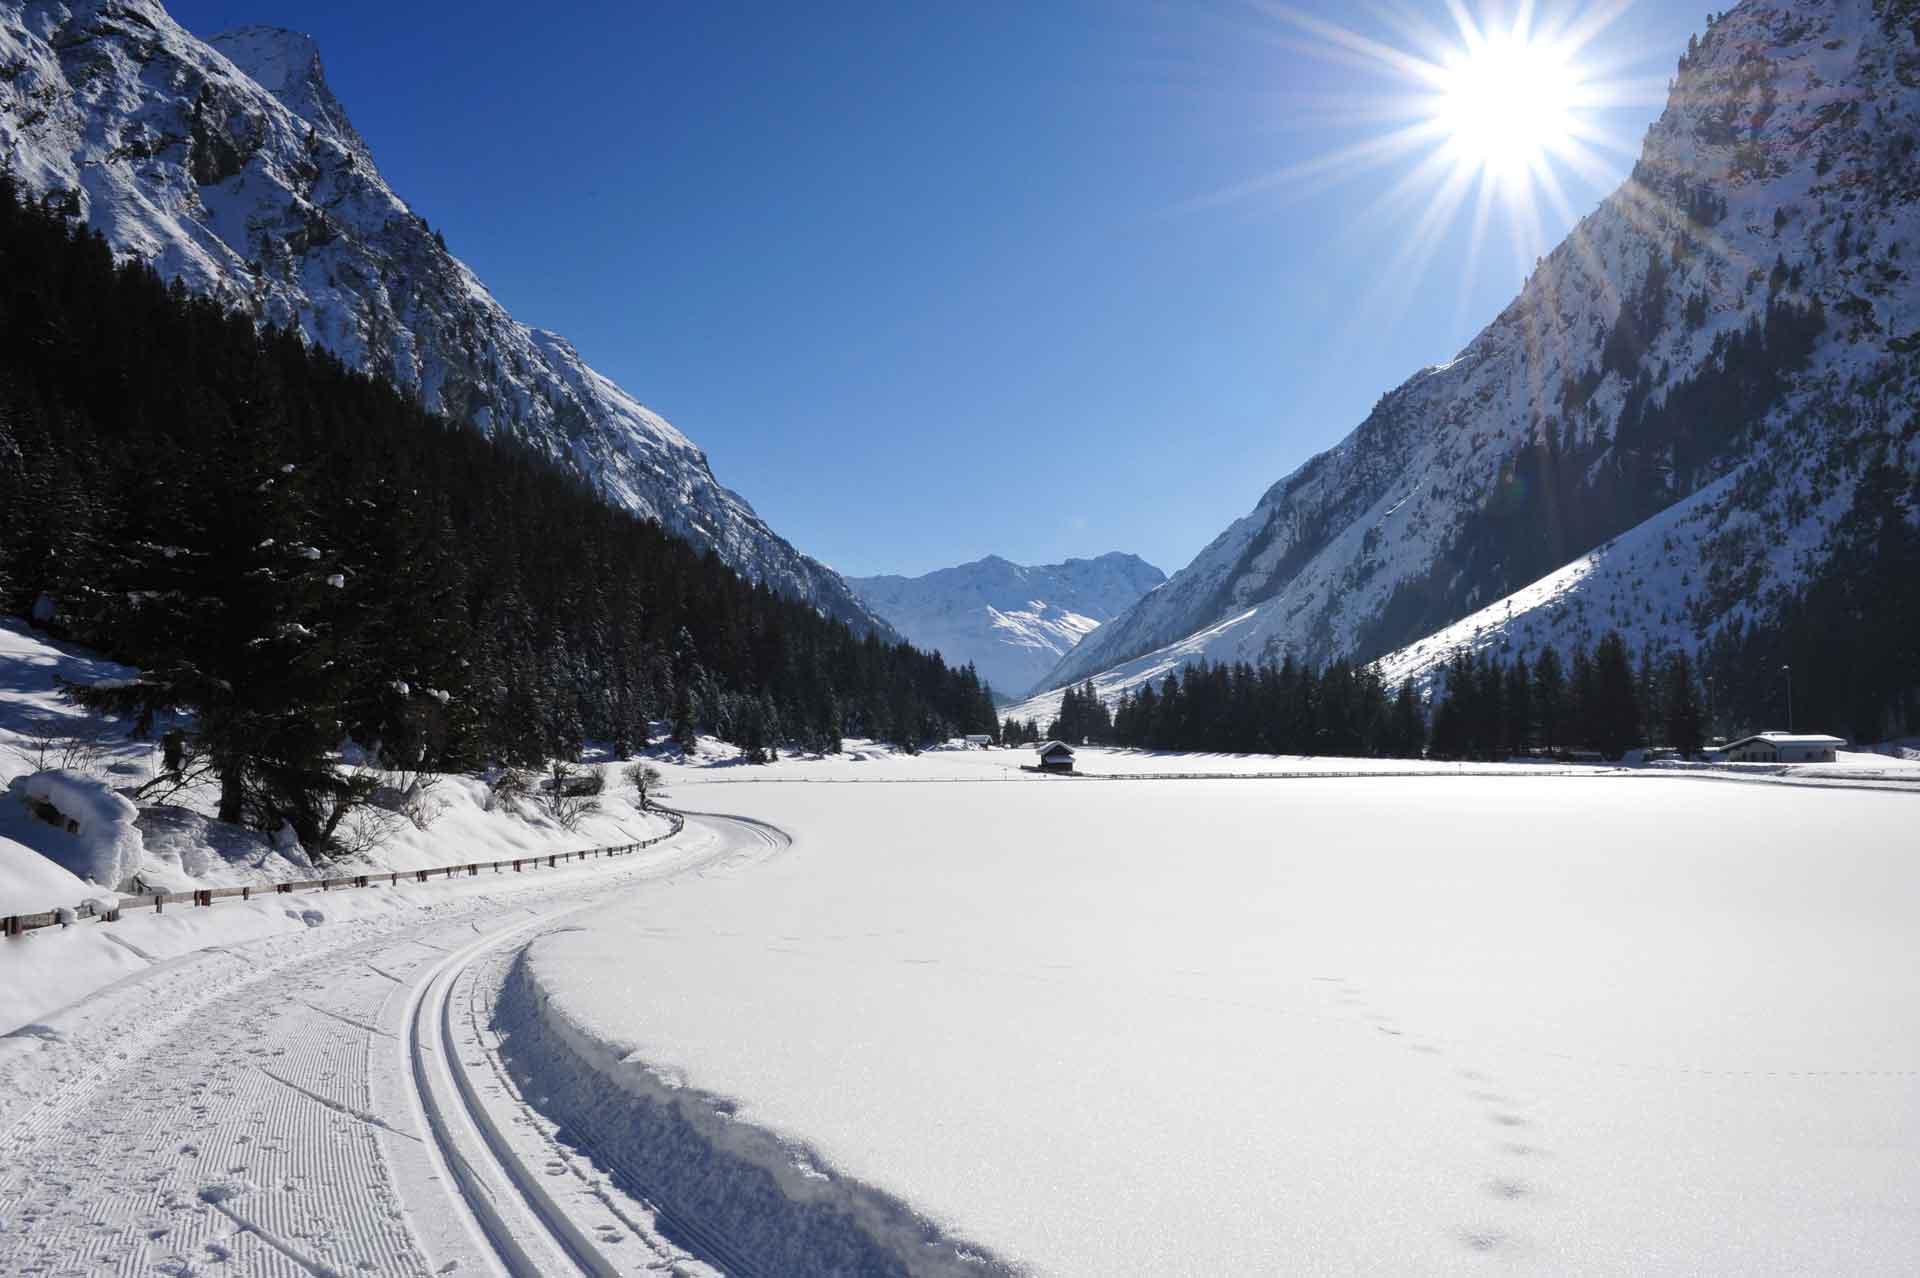 winterparadies-stillebach-mit-loipe